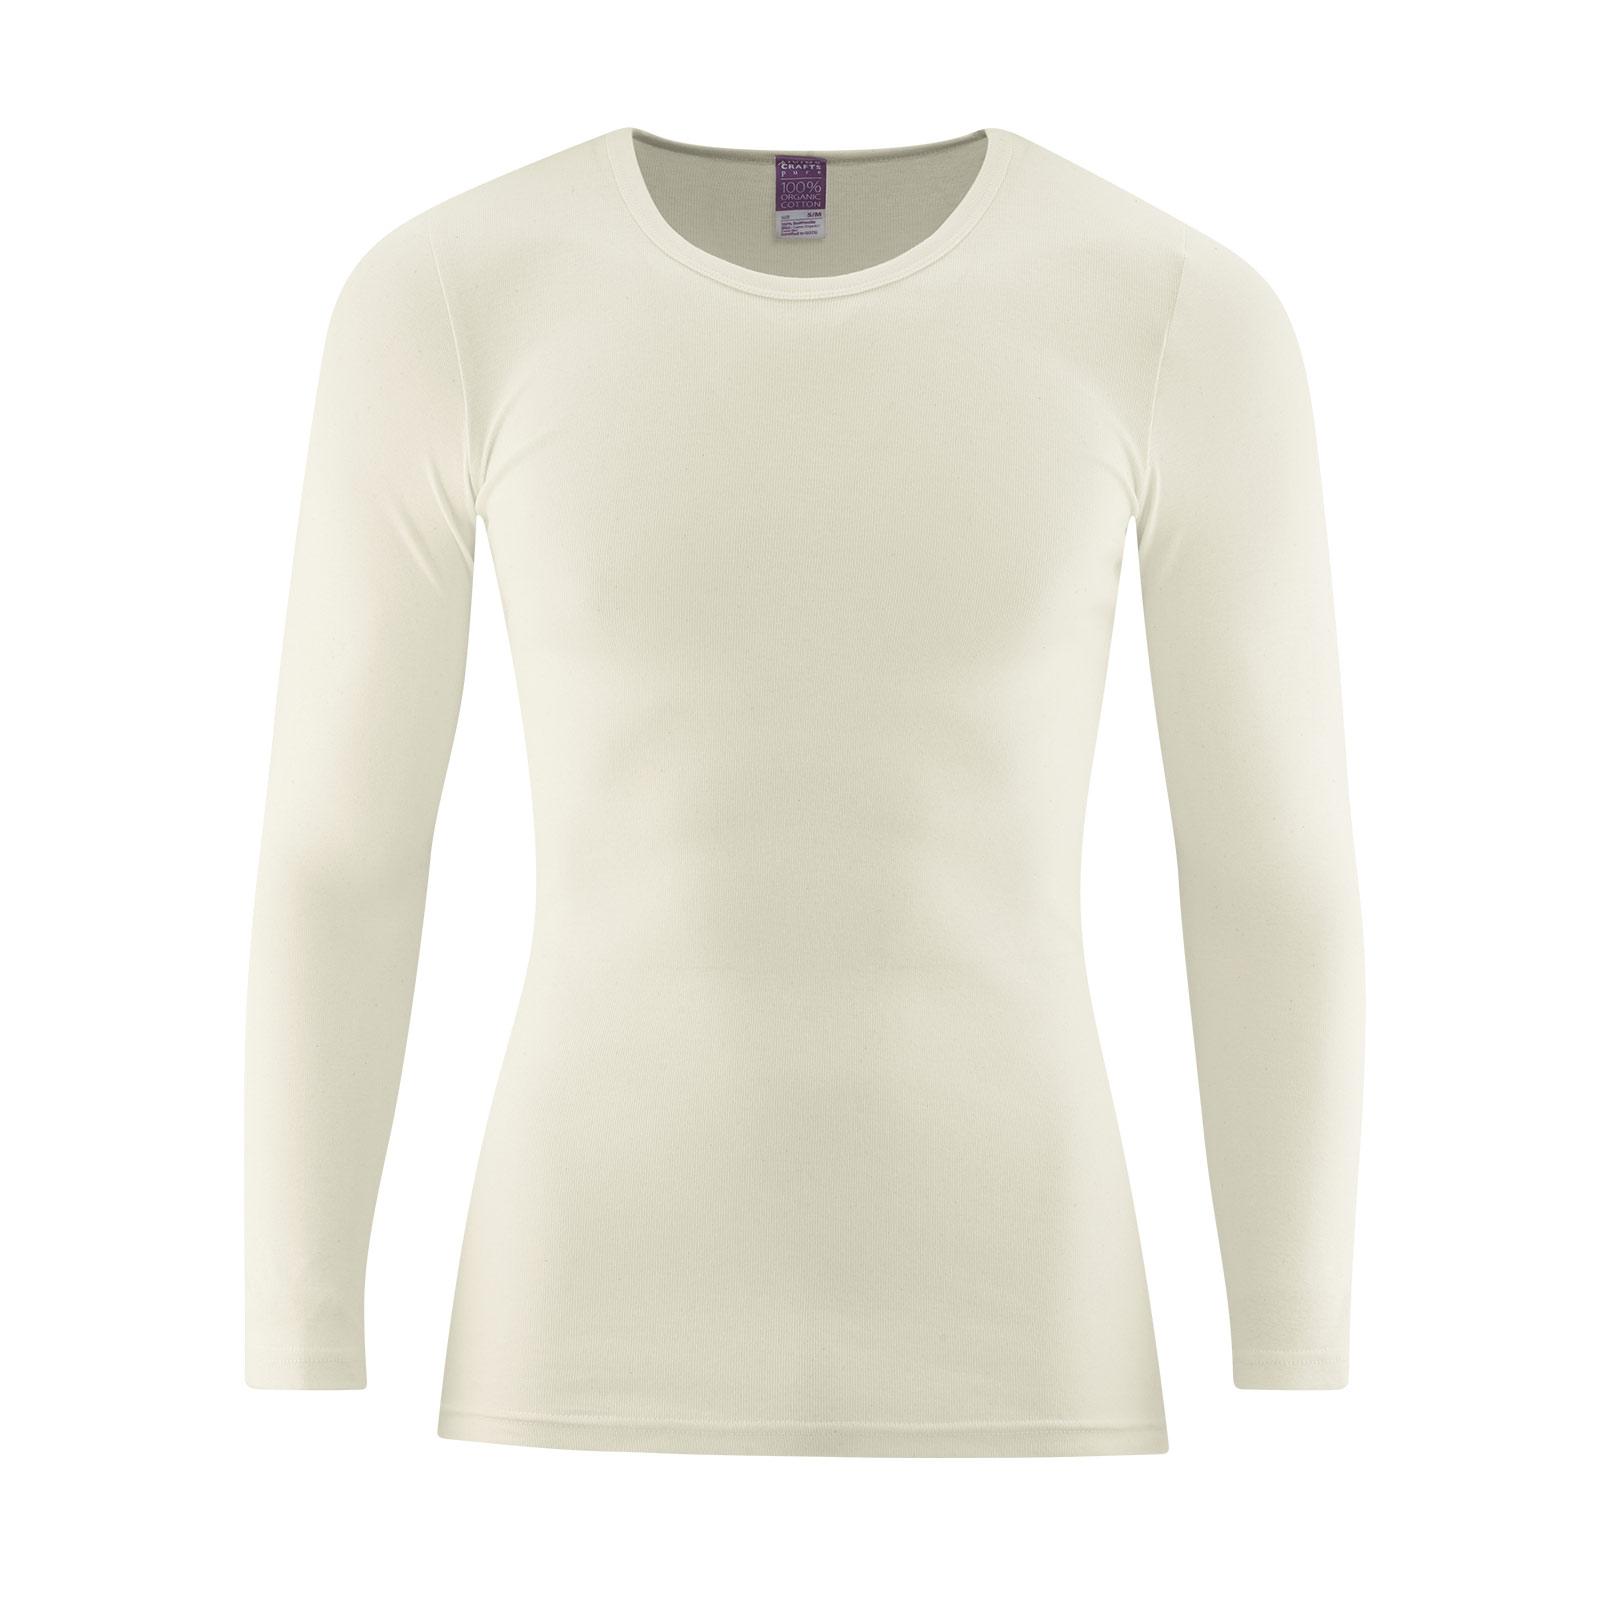 1660c65013c9f6 Living Crafts Longsleeve Shirt Herren aus Bio-Baumwolle - PureNature